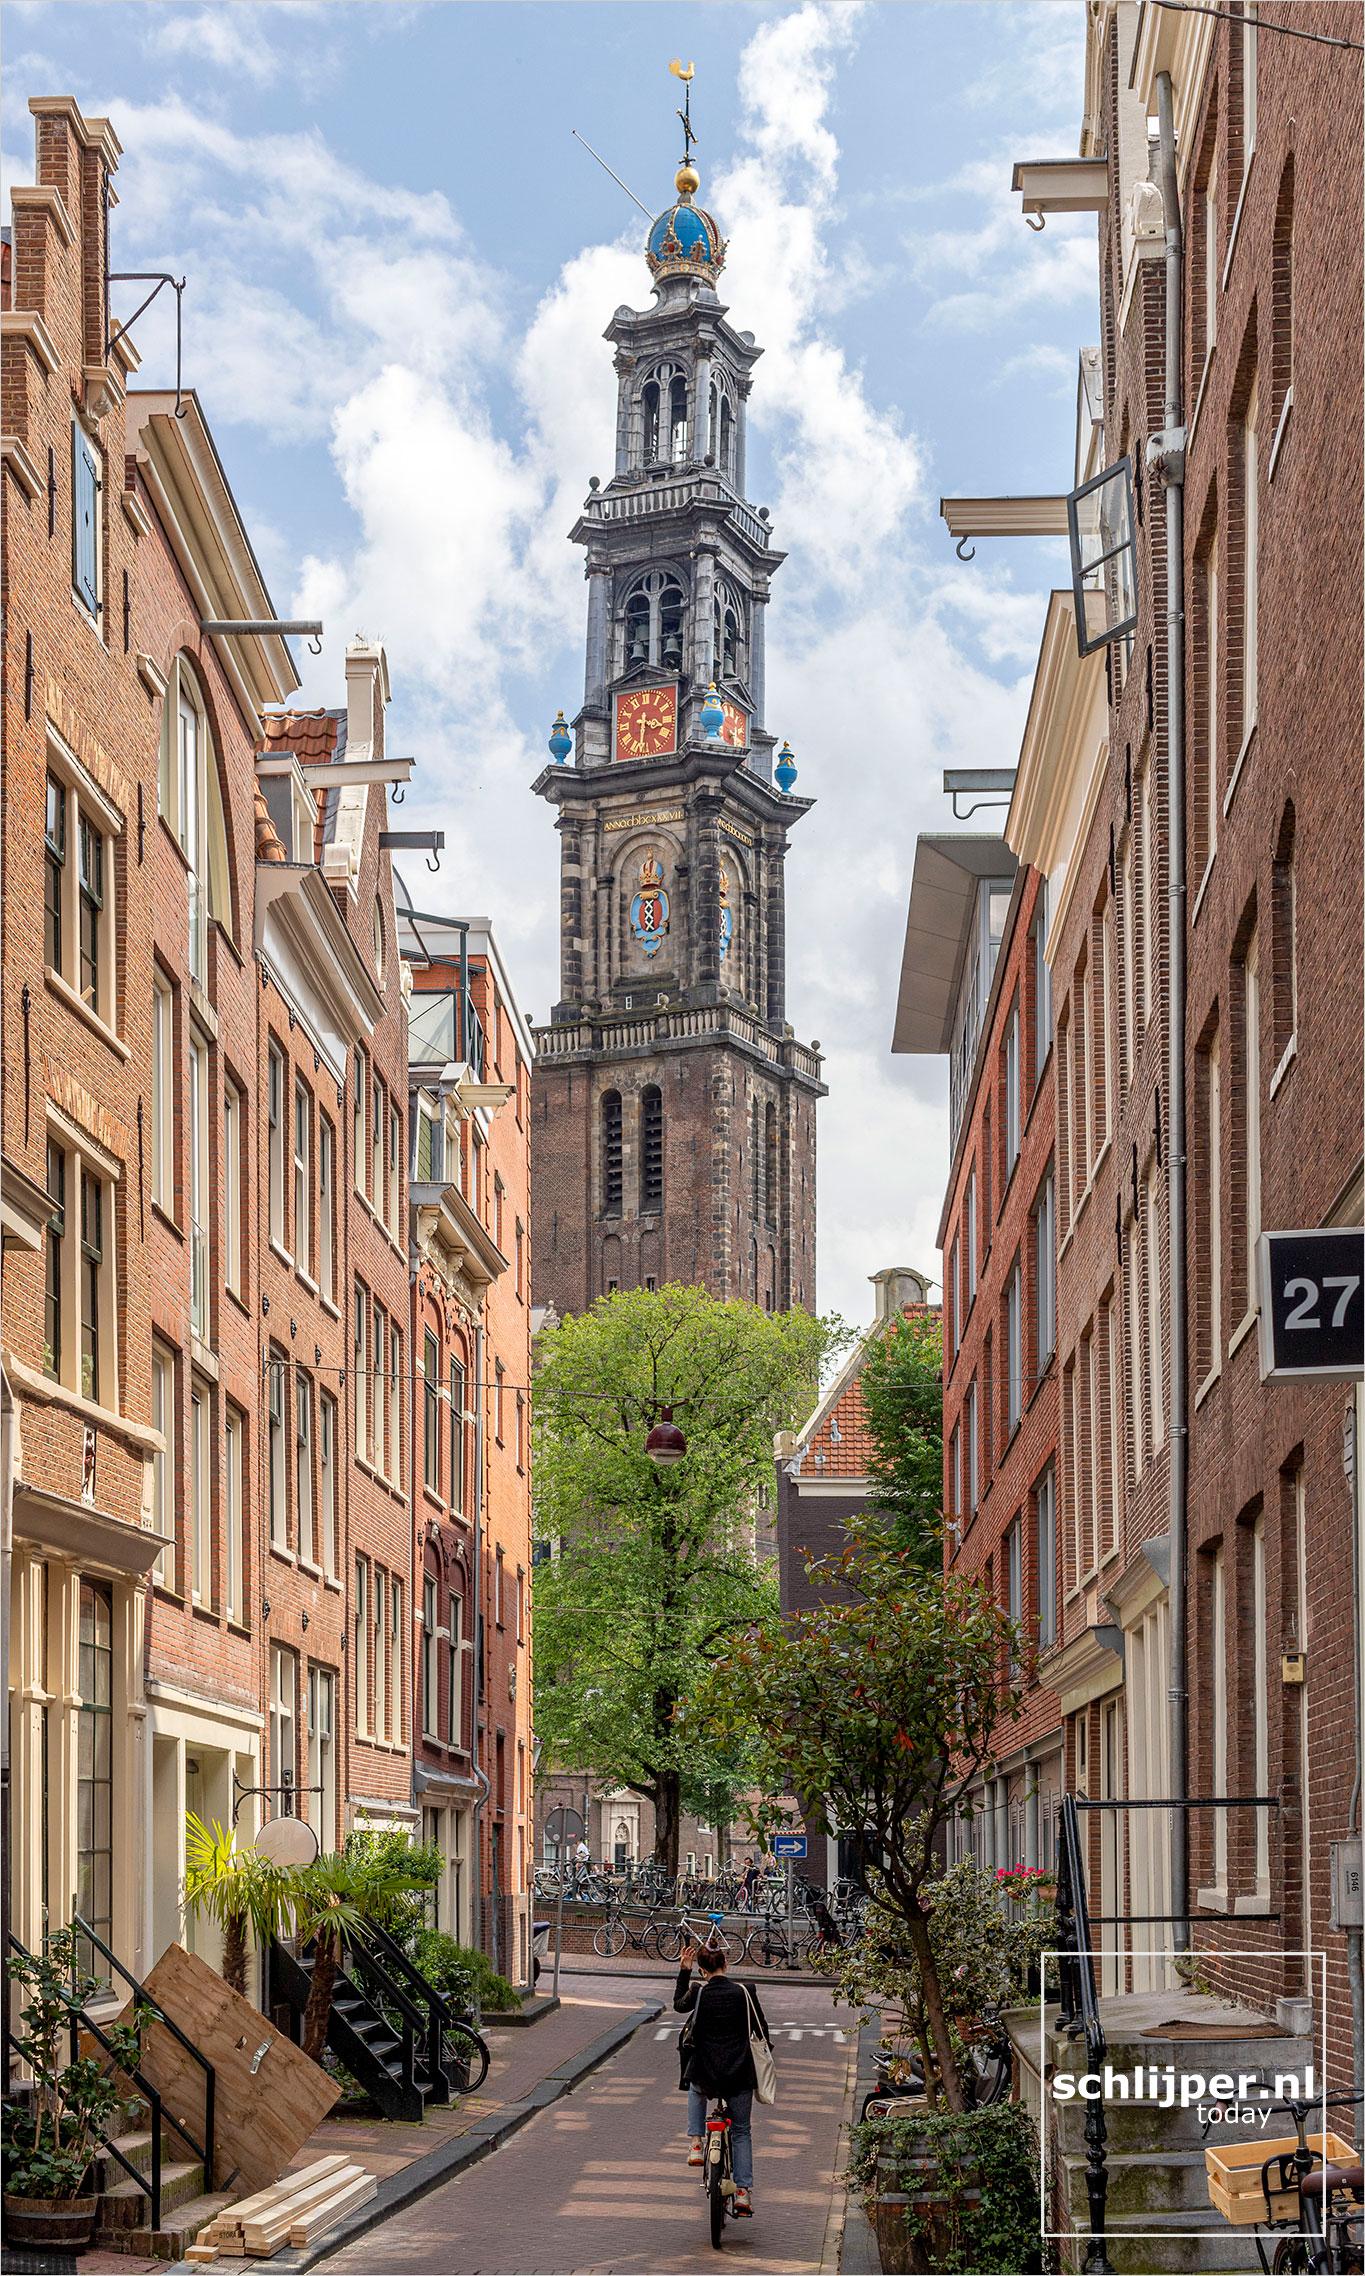 The Netherlands, Amsterdam, 7 juli 2021